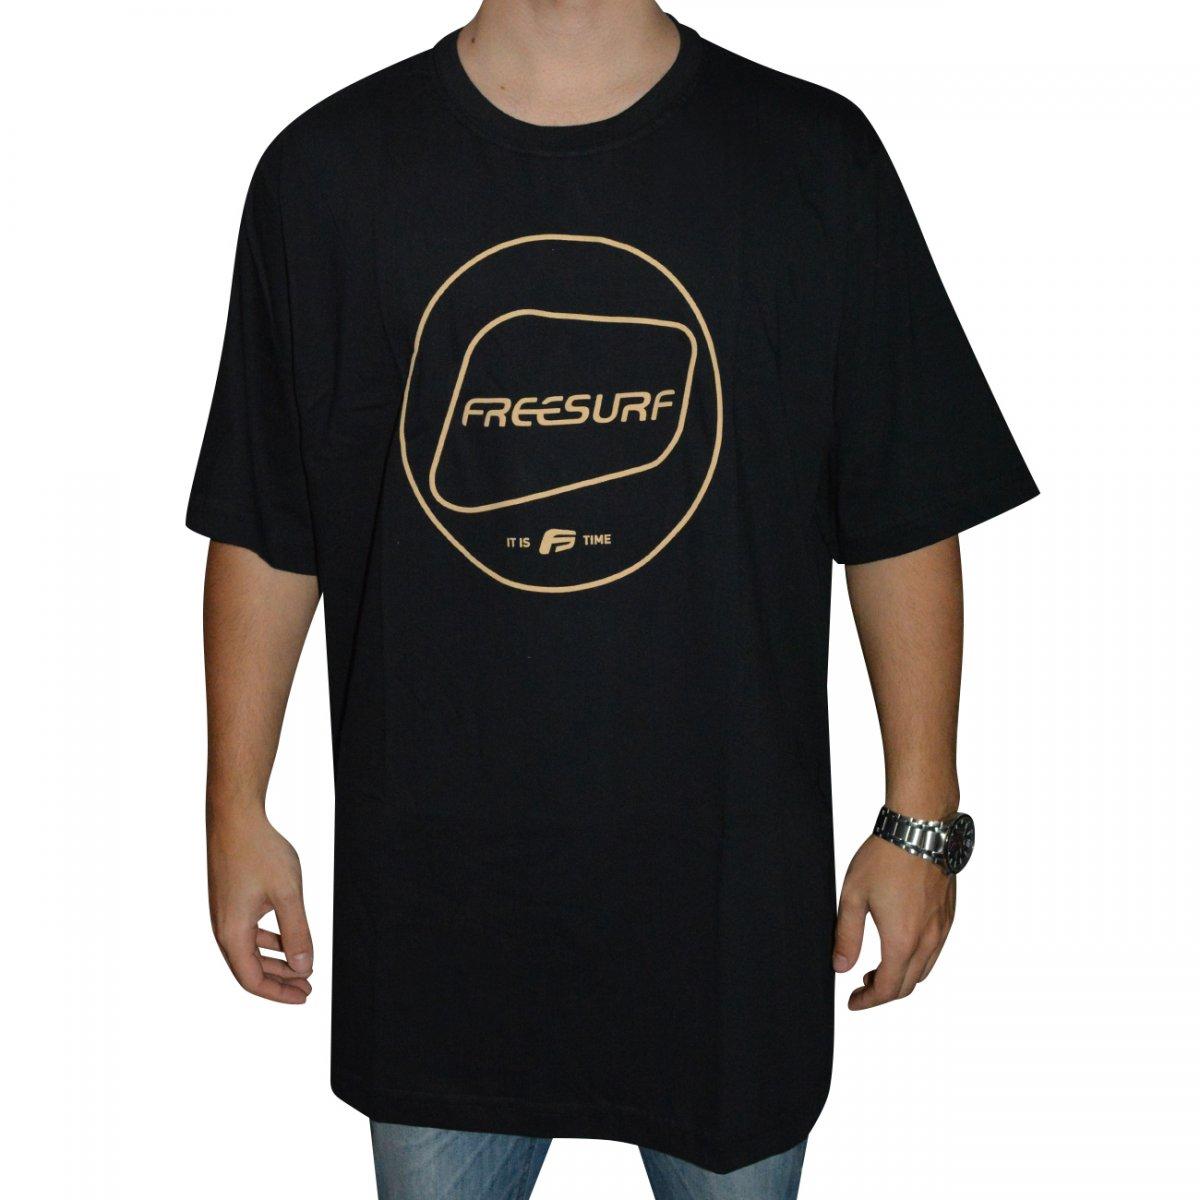 0249e042161c8 Camiseta Free Surf Basic Big Size 110406052 - Preto - Chuteira Nike,  Adidas. Sandalias Femininas. Sandy Calçados